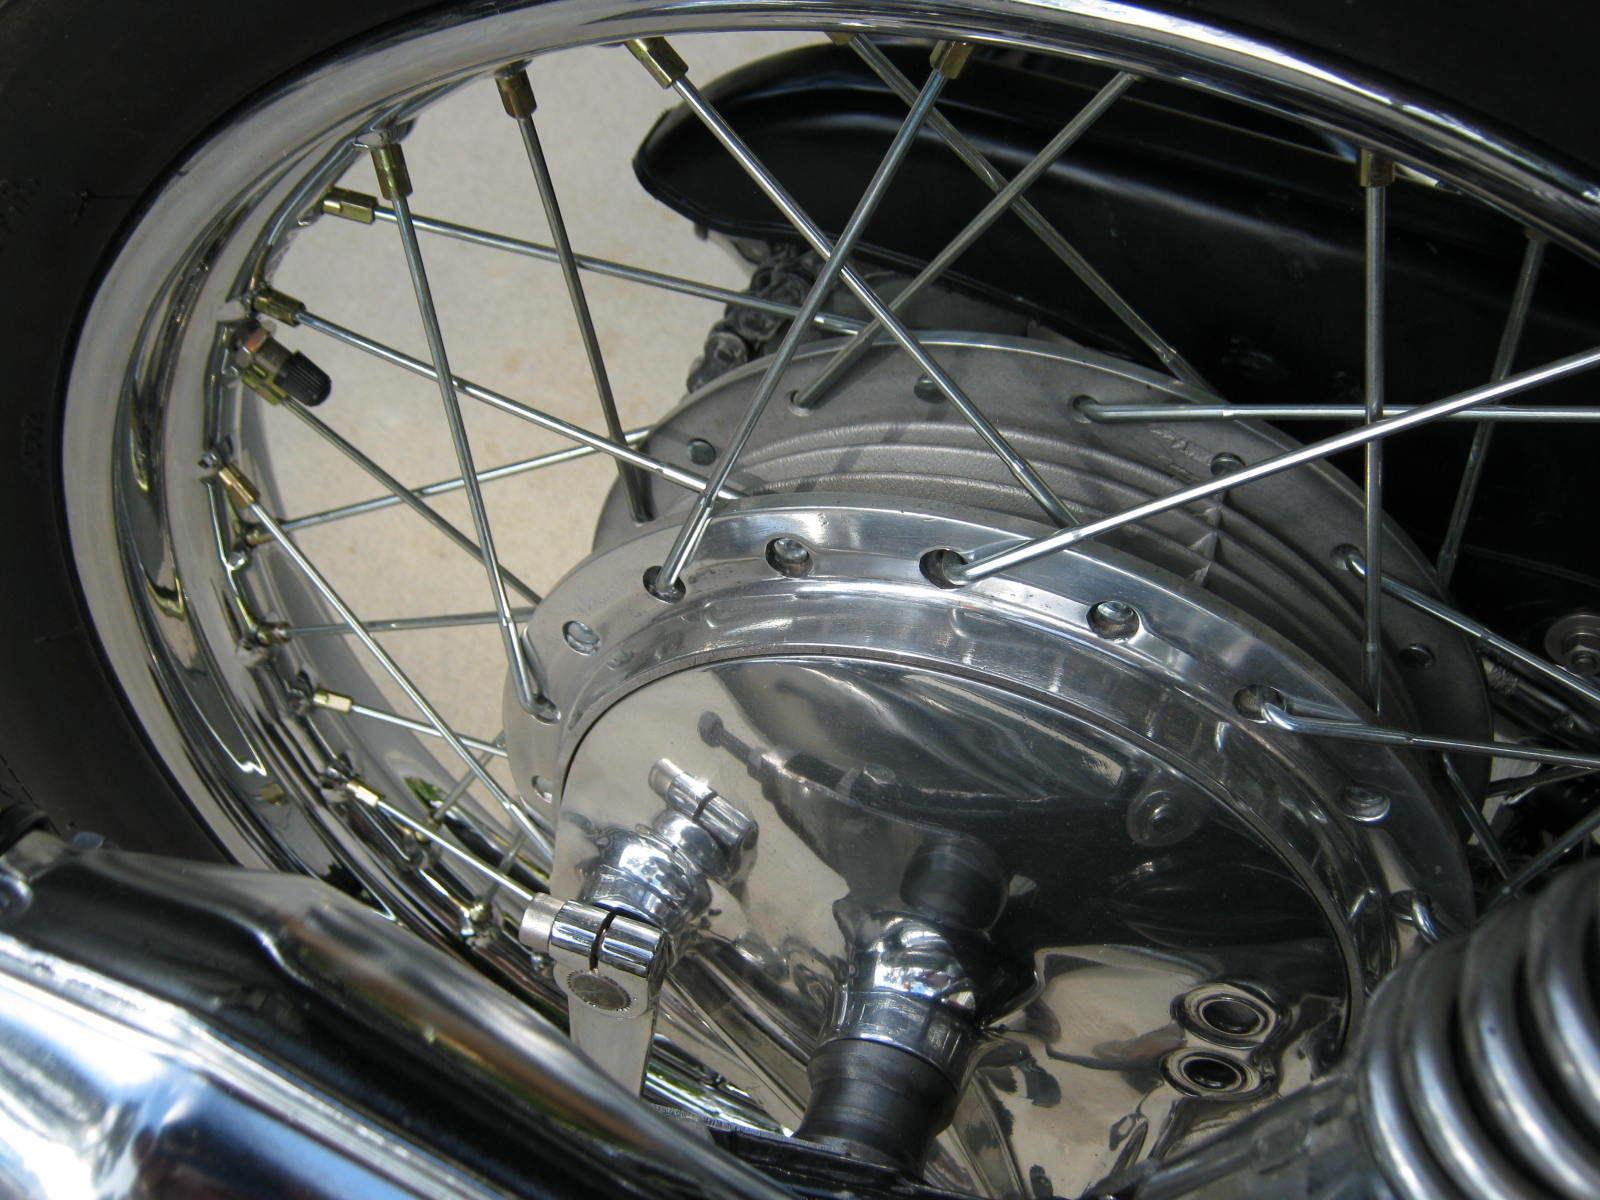 Honda CB750K0 -1969 - Rear Wheel, Rear hub, Spokes, Spacer and Valve,